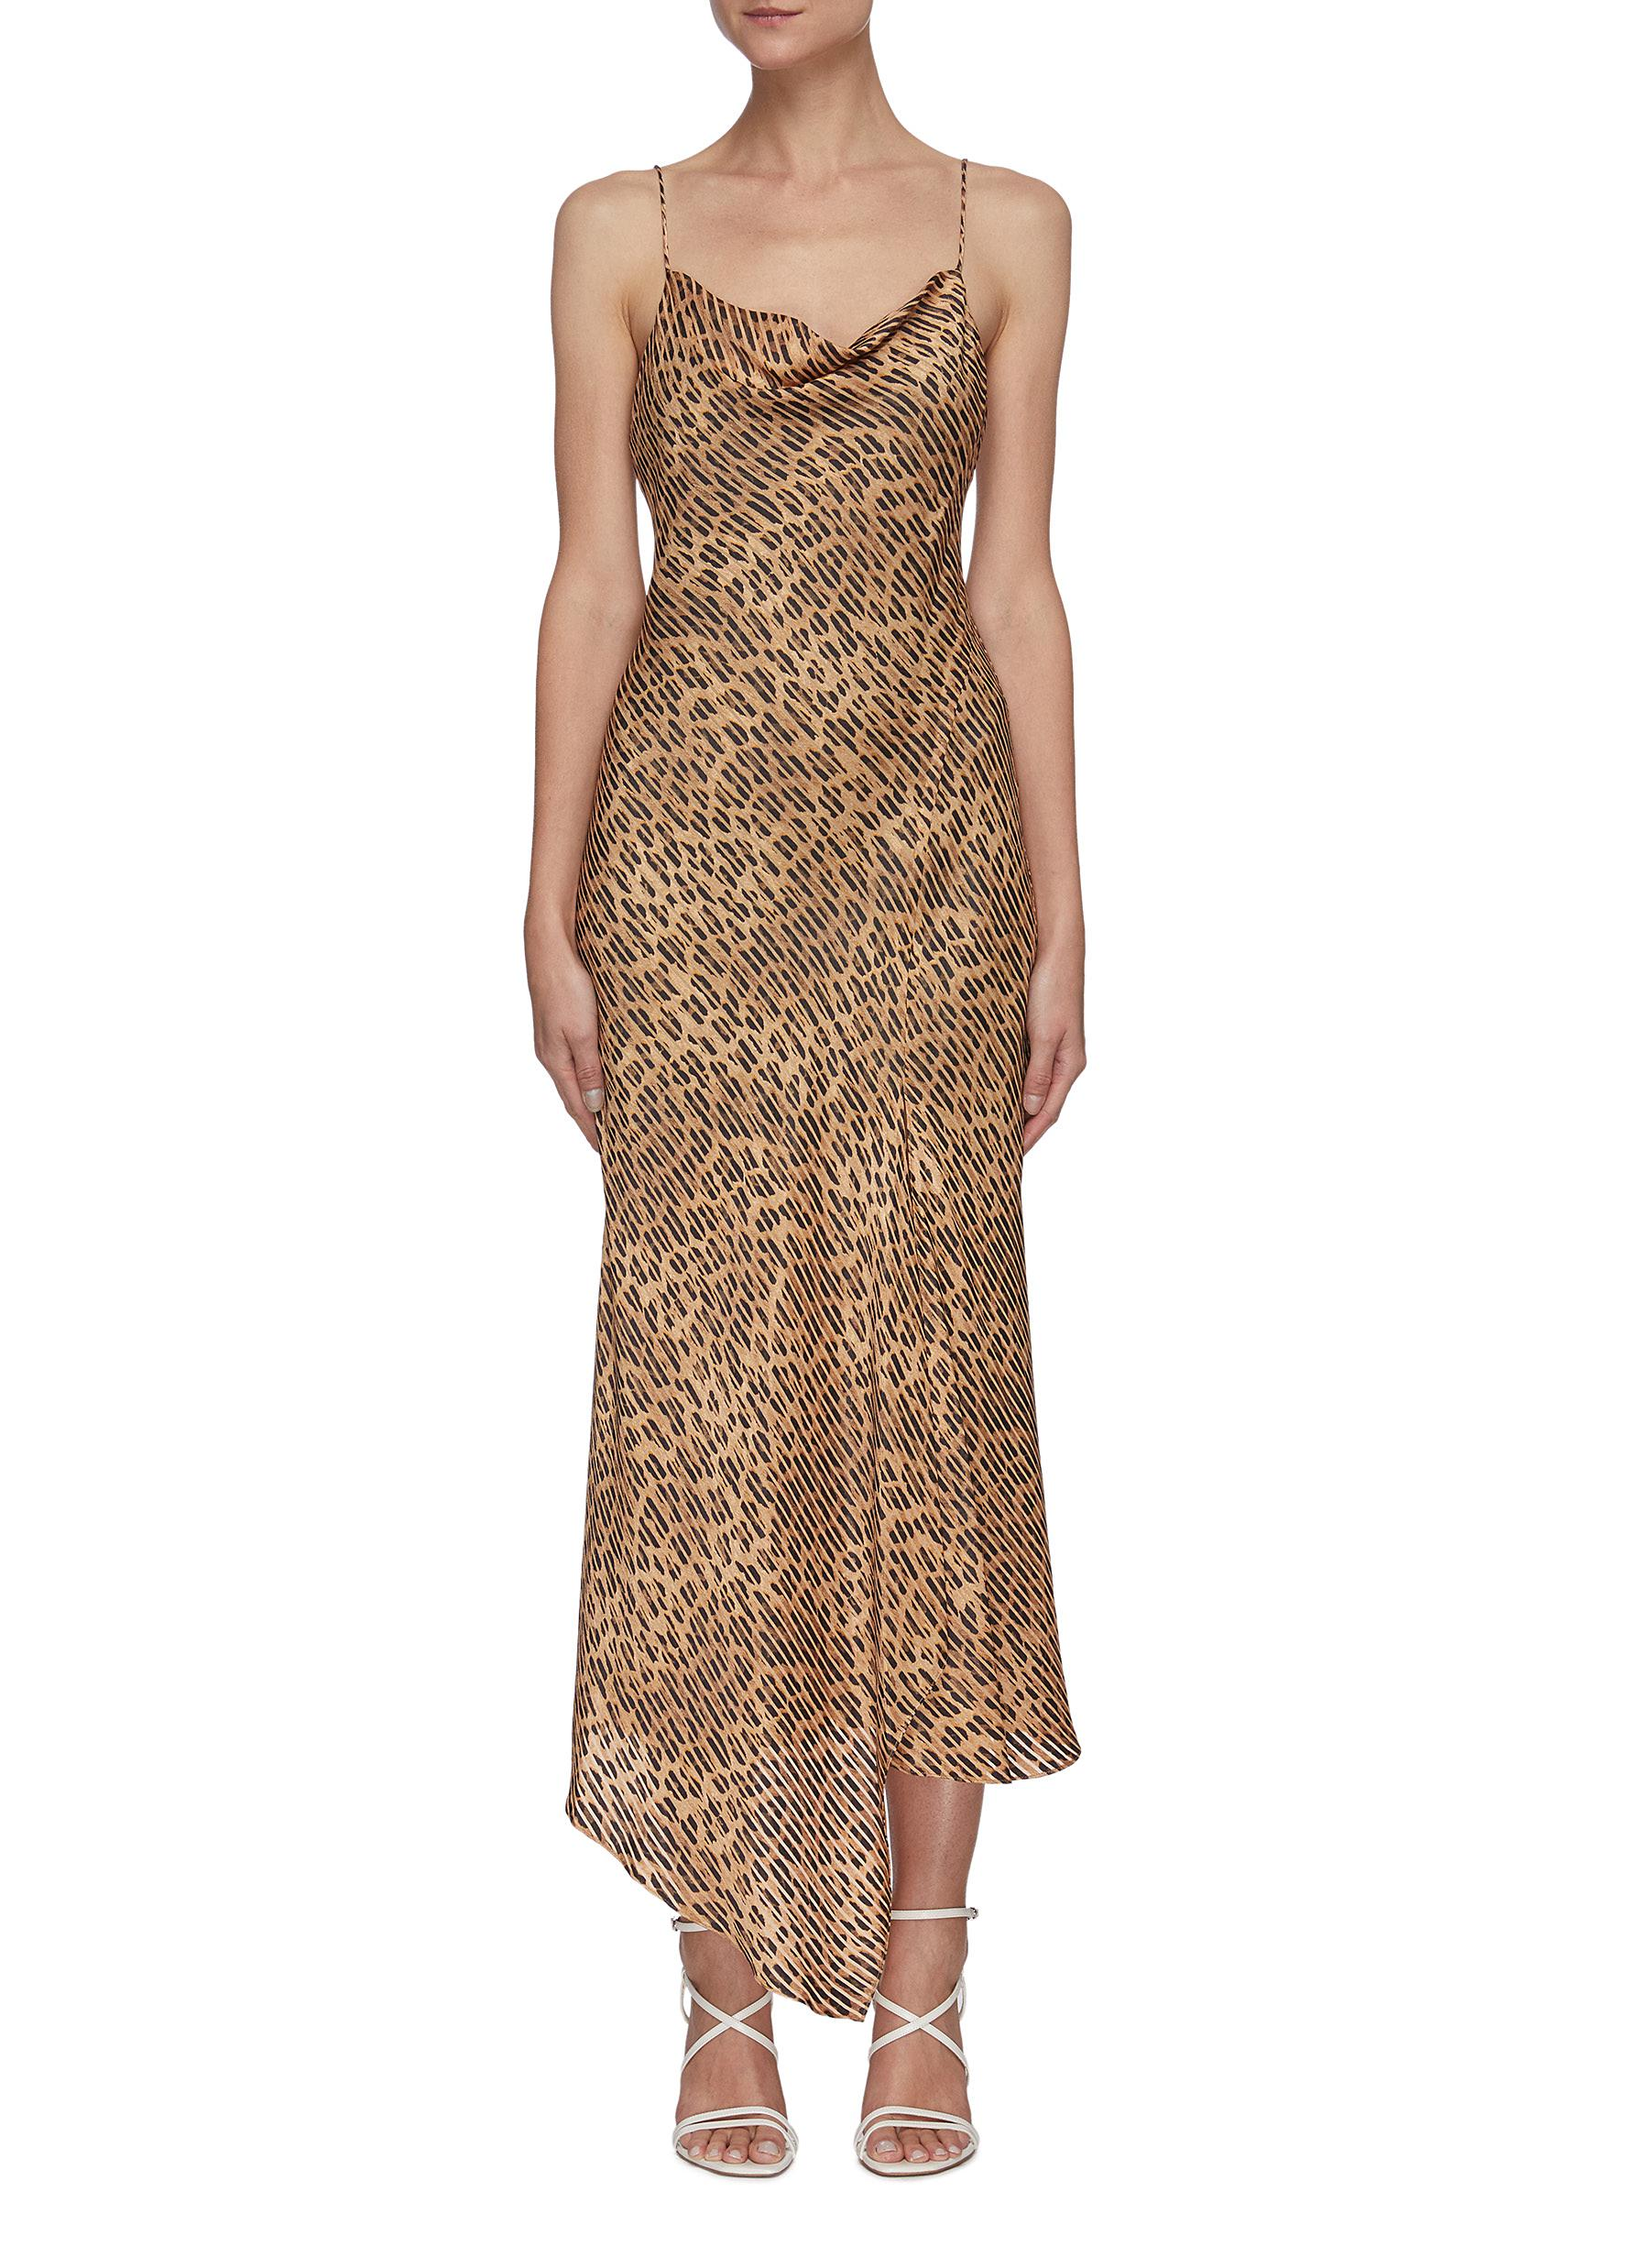 HARMONY' Drape Collar Slit Front Asymmetric Slip Midi Dress - ALICE + OLIVIA - Modalova